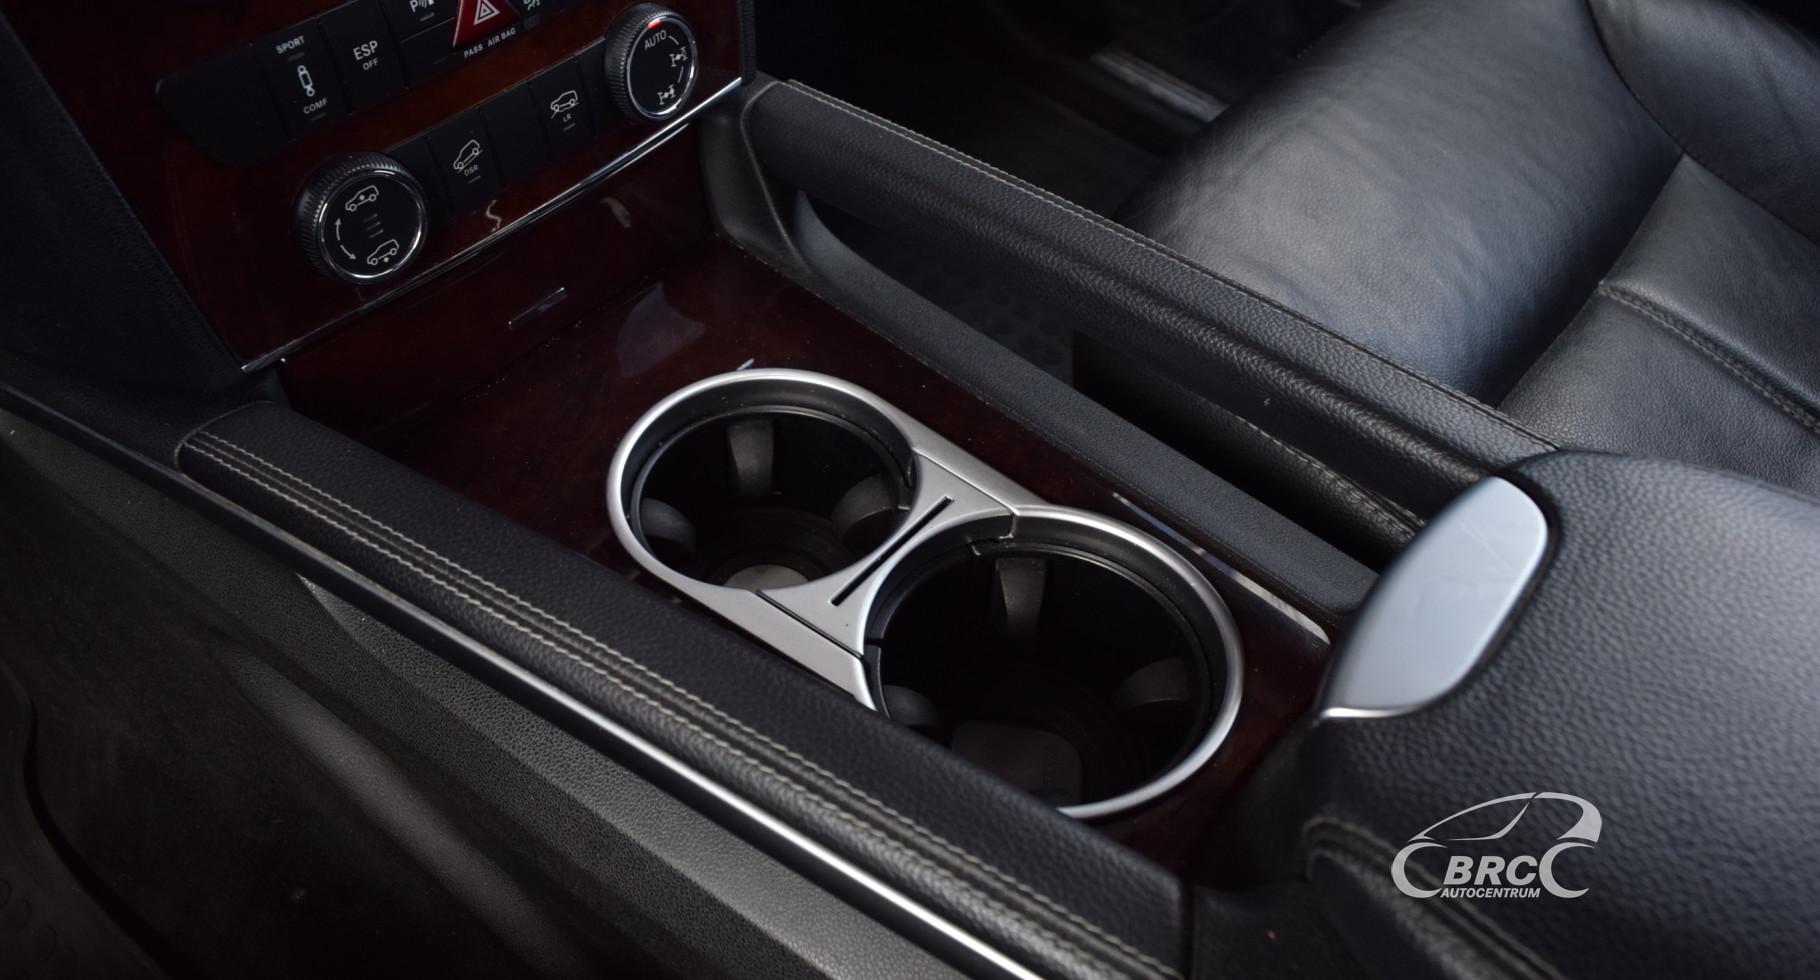 Mercedes-Benz GL 320 CDi 4Matic